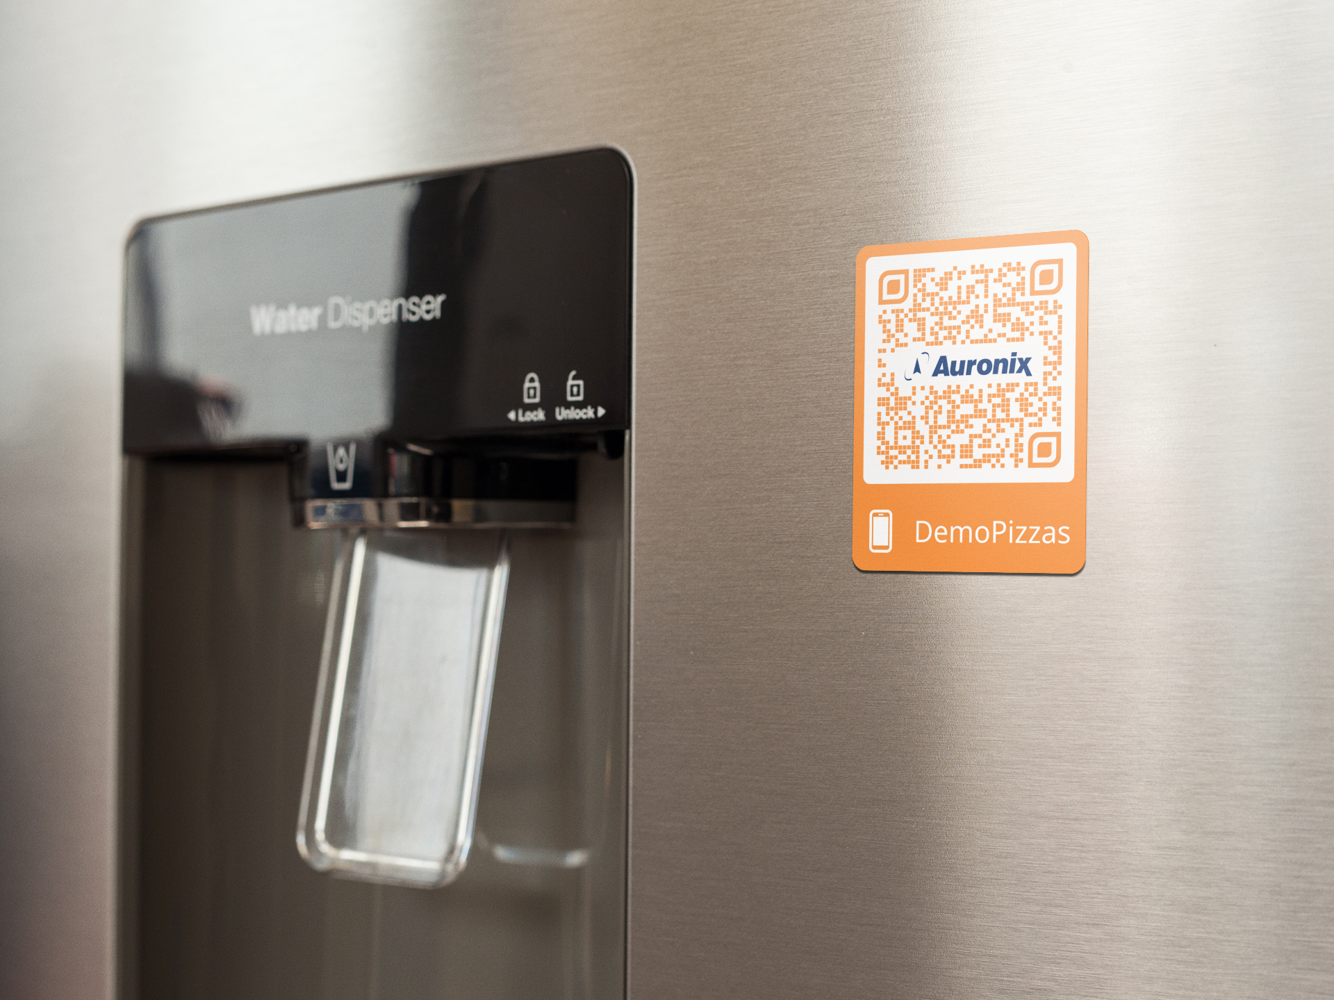 fridge-magnet-mockup-on-a-metallic-fridge-near-the-water-dispenser-a14790